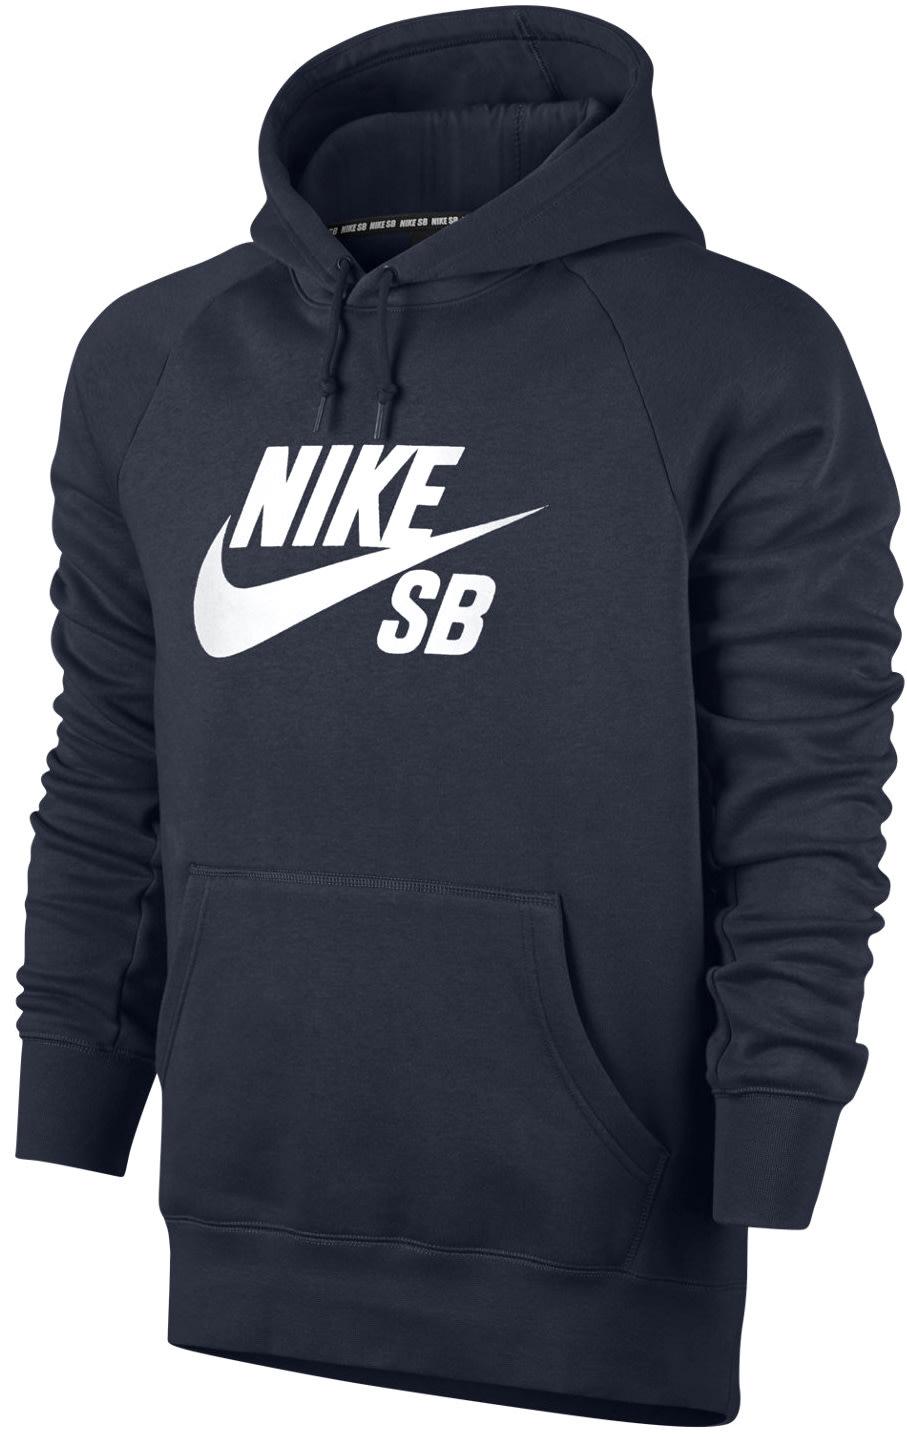 Nike SB Icon PO Hoodie nk3sip04ow16zz-nike-hoodies